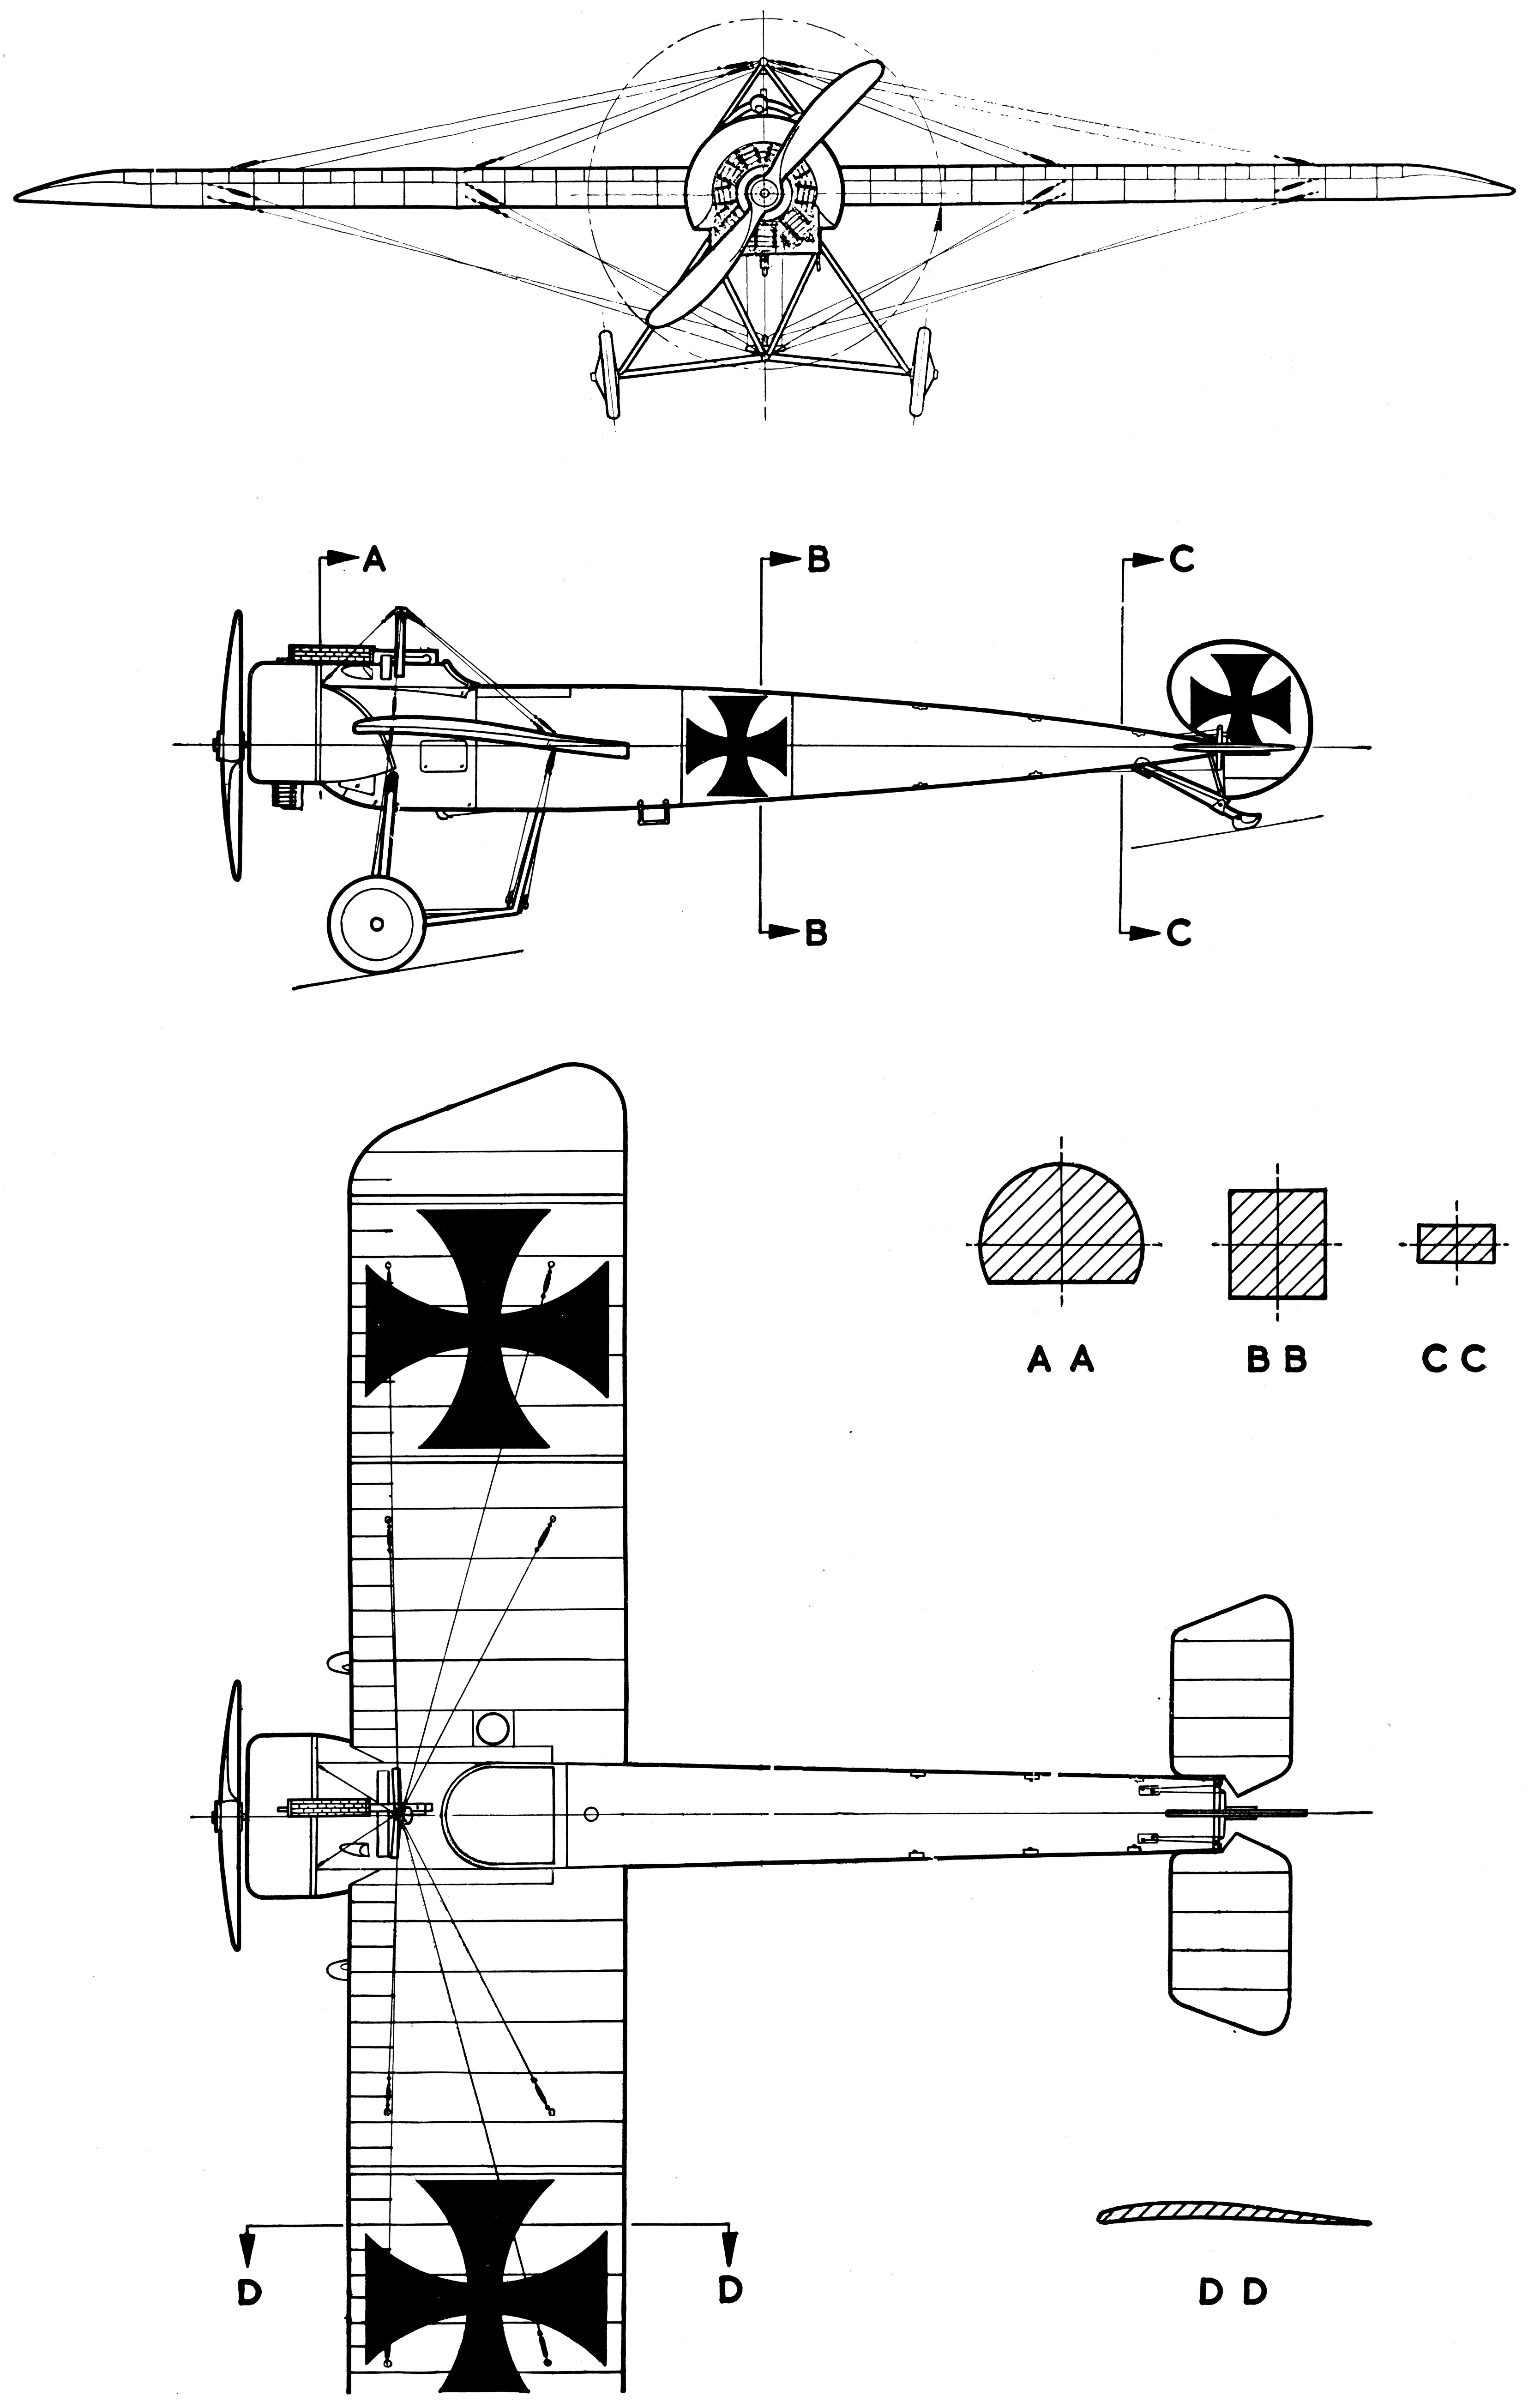 Fokker E.III blueprint